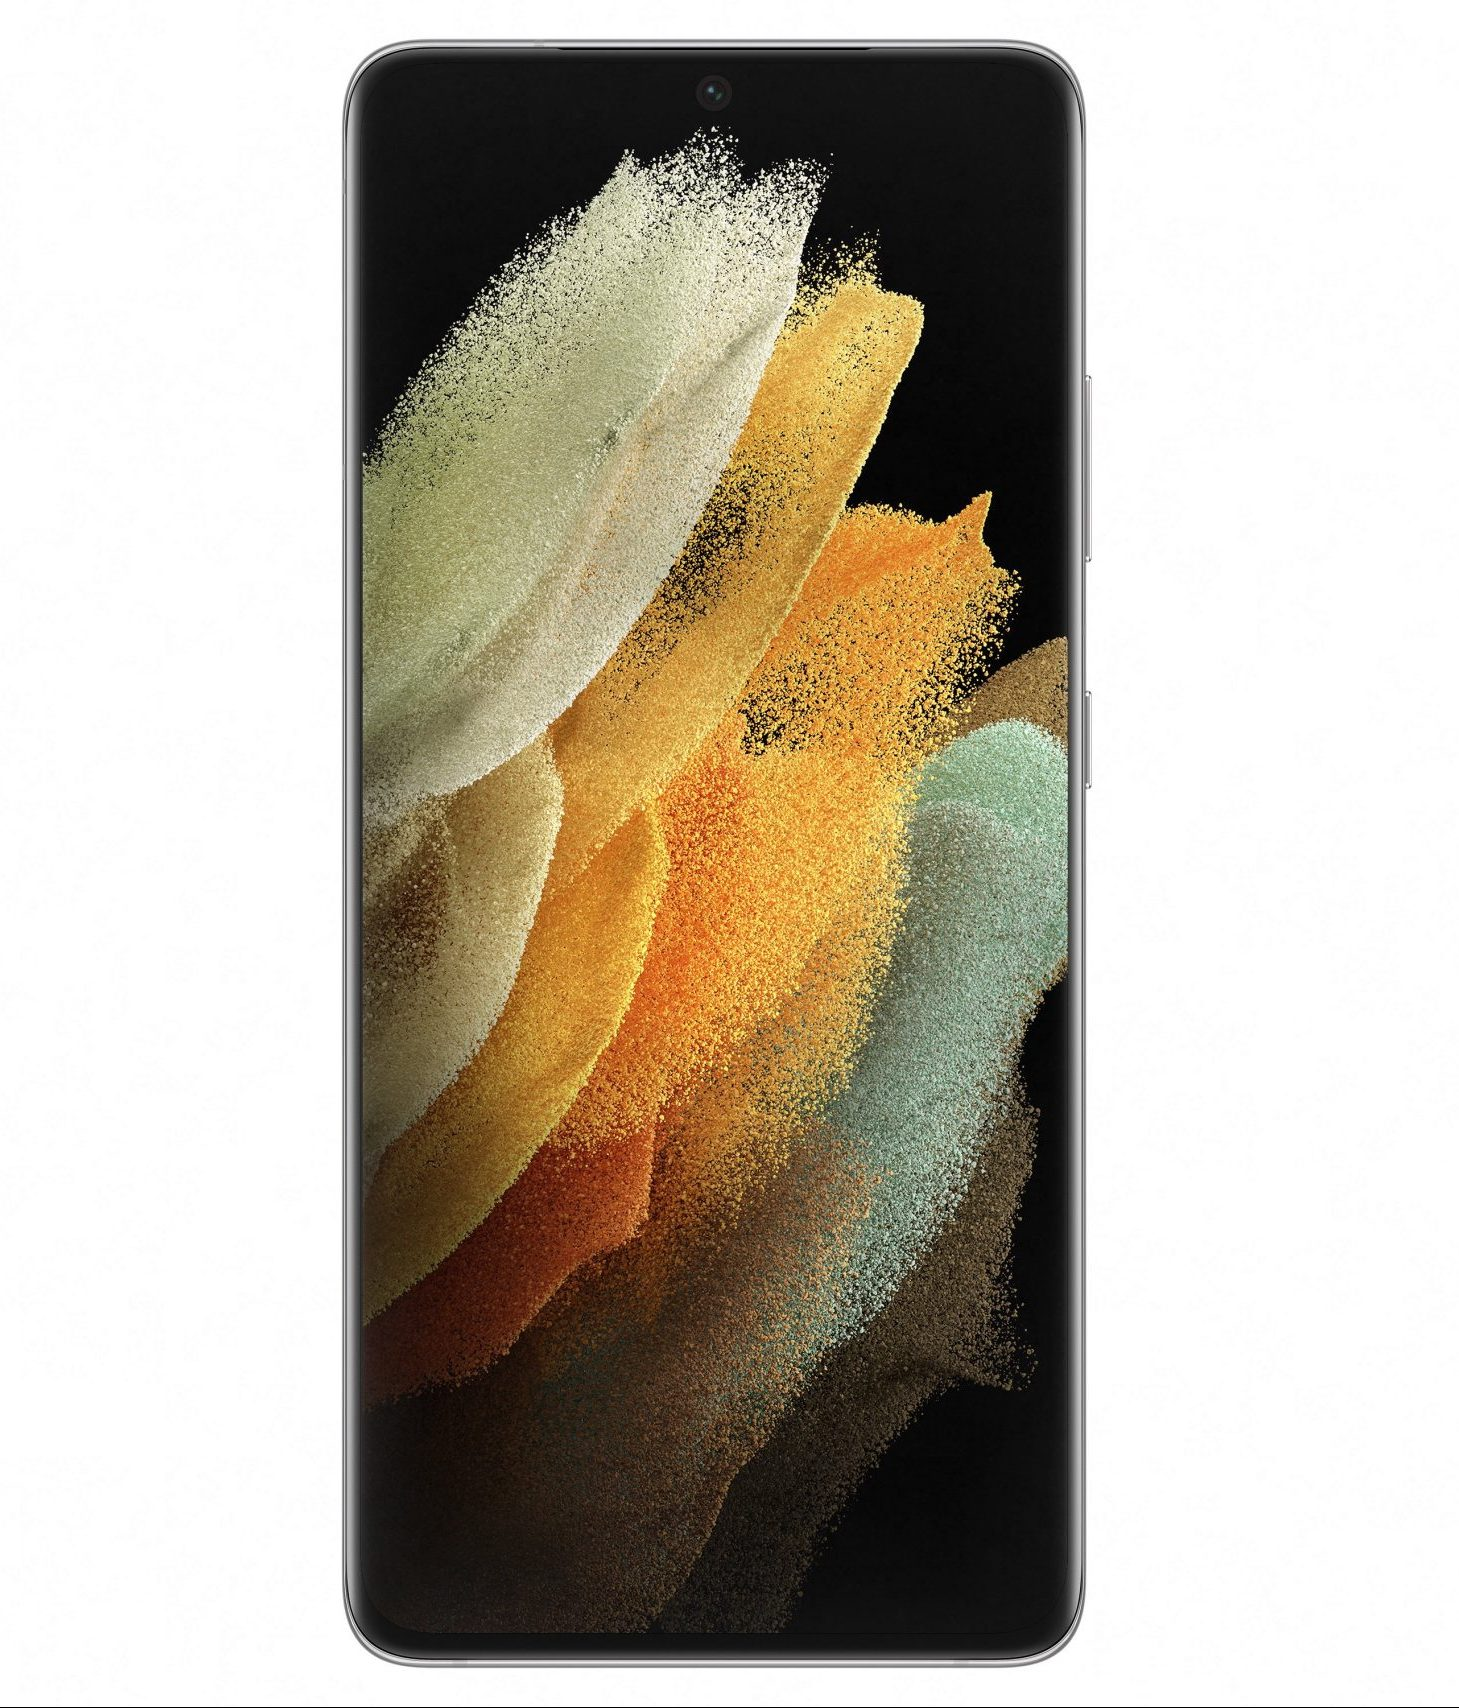 Samsung Galaxy S21 Ultra 5G - www.vodafone.co (1)